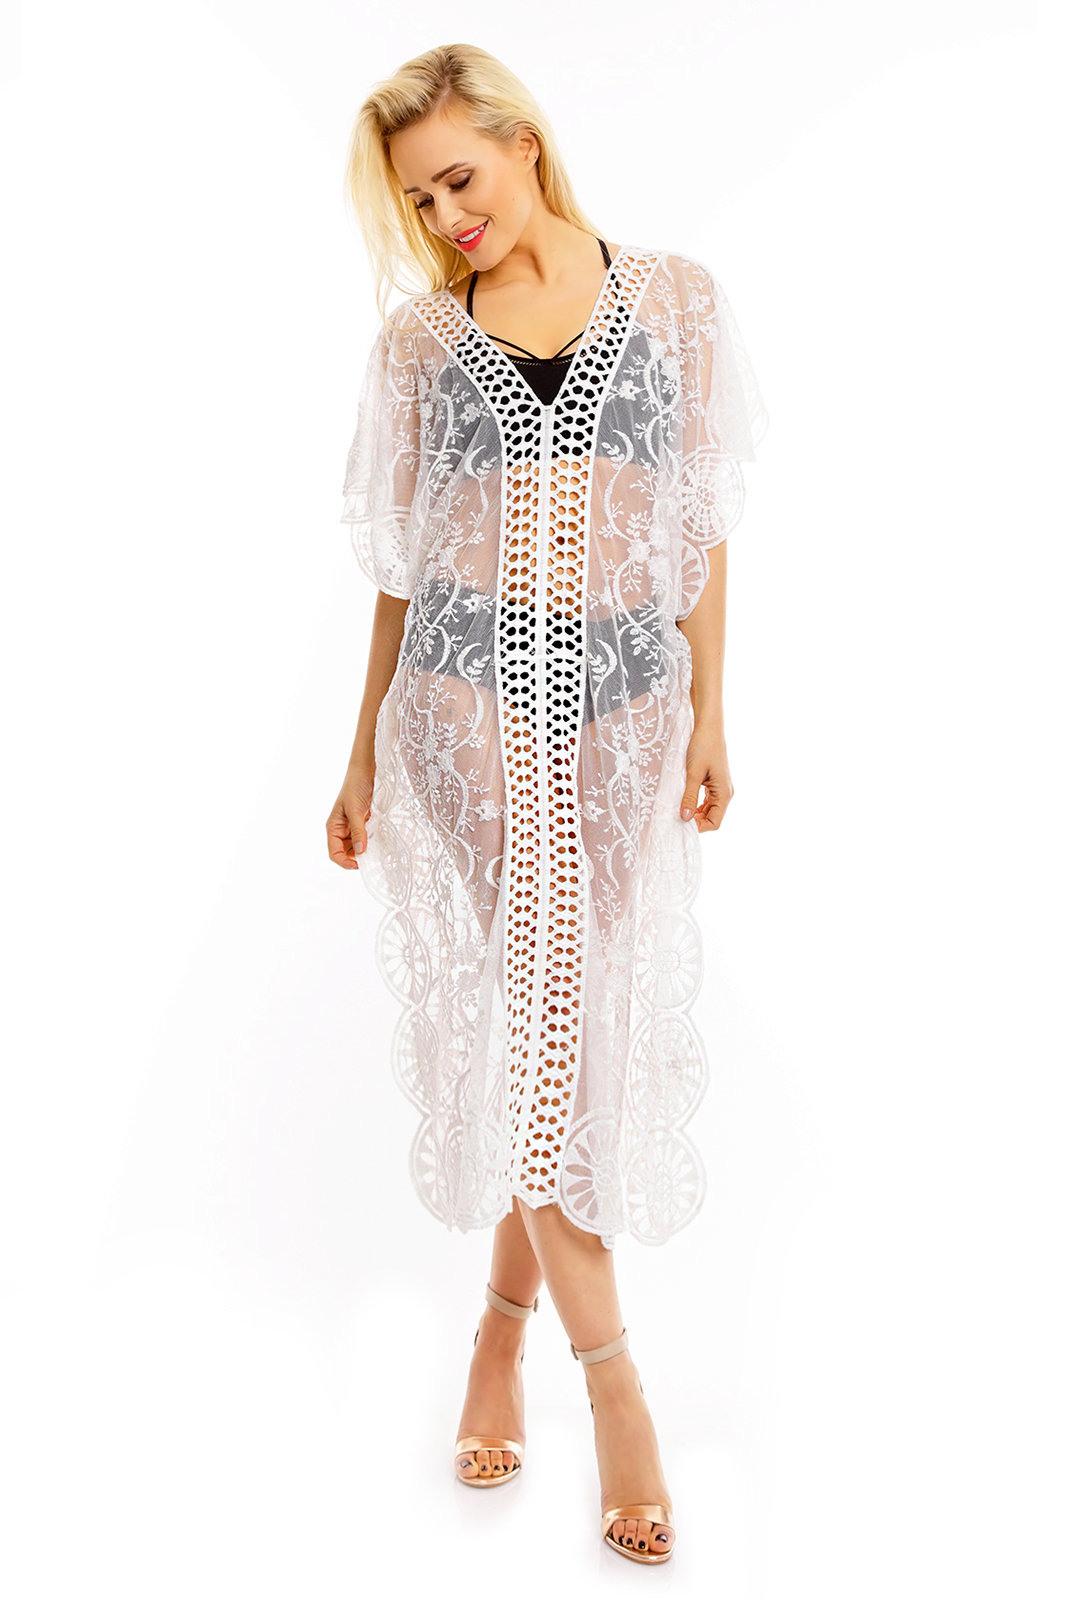 Dammen Sommer Tunika Strand Ibiza Kleid Spitze Mozaik